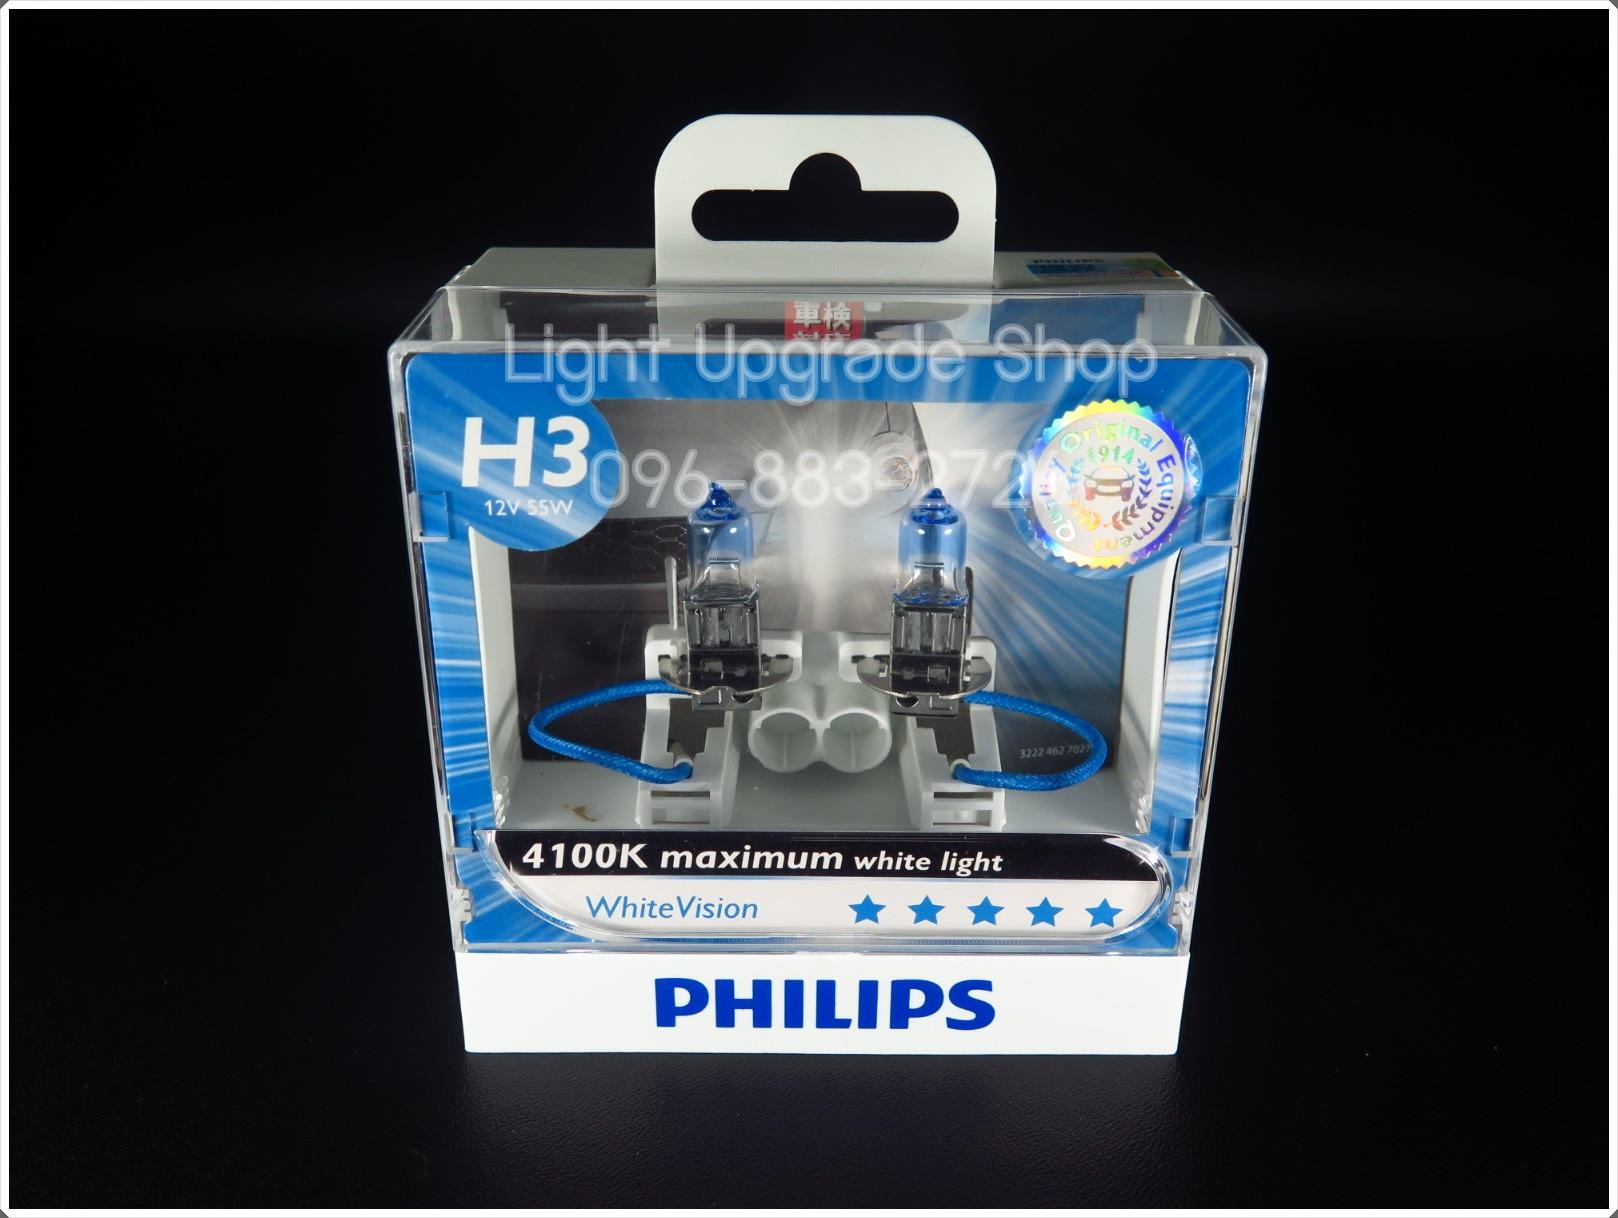 Philips White Vision 4100K [H3]